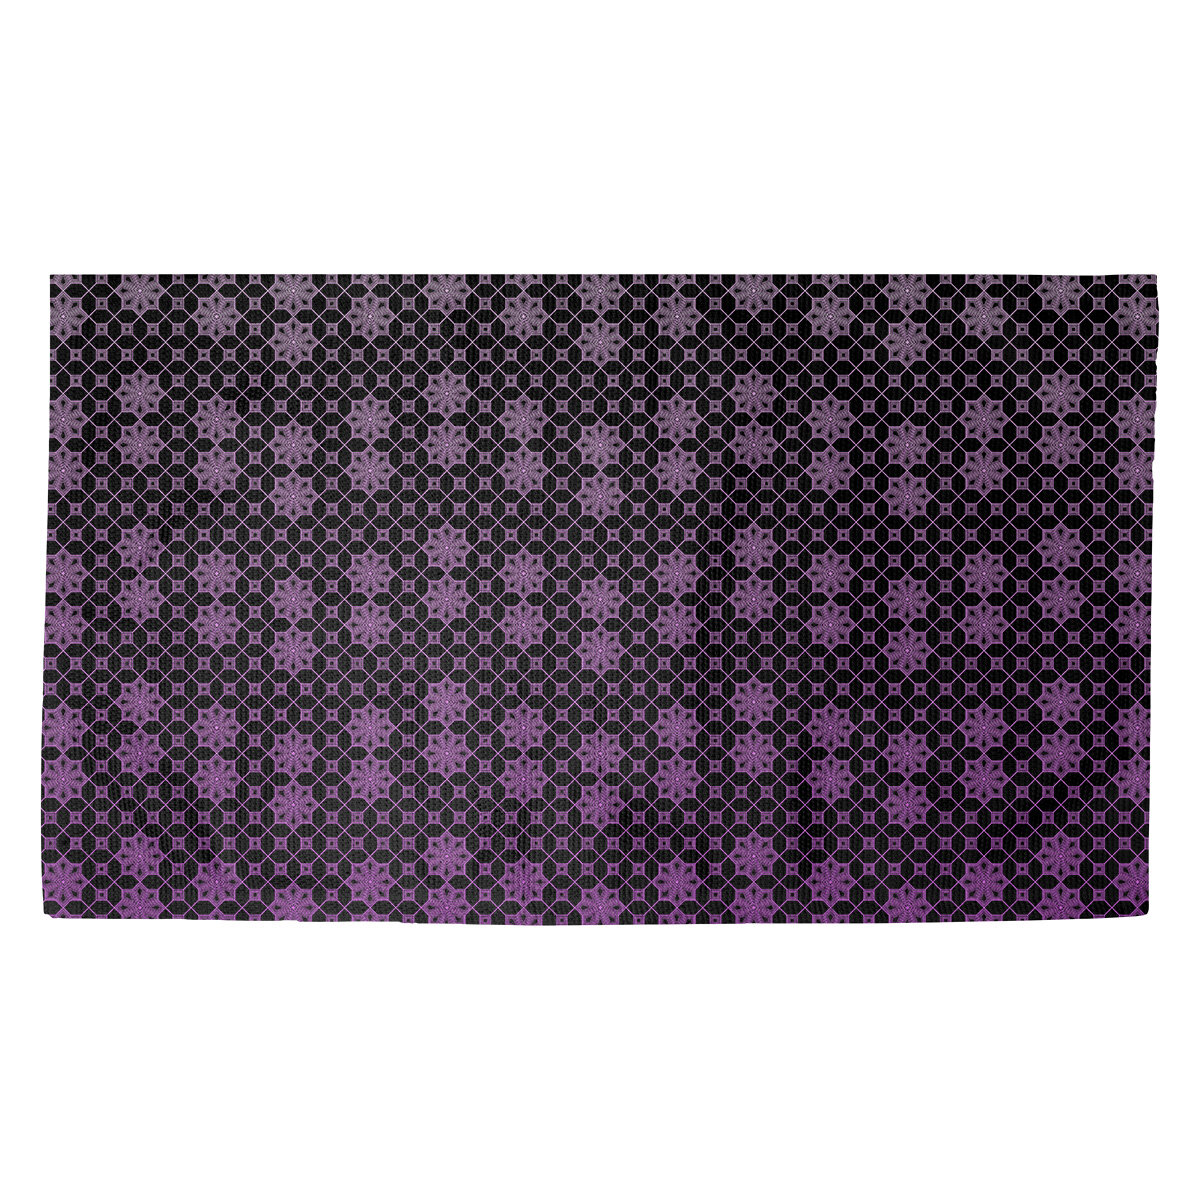 Latitude Run Avicia Lattice Purple Black Area Rug Wayfair